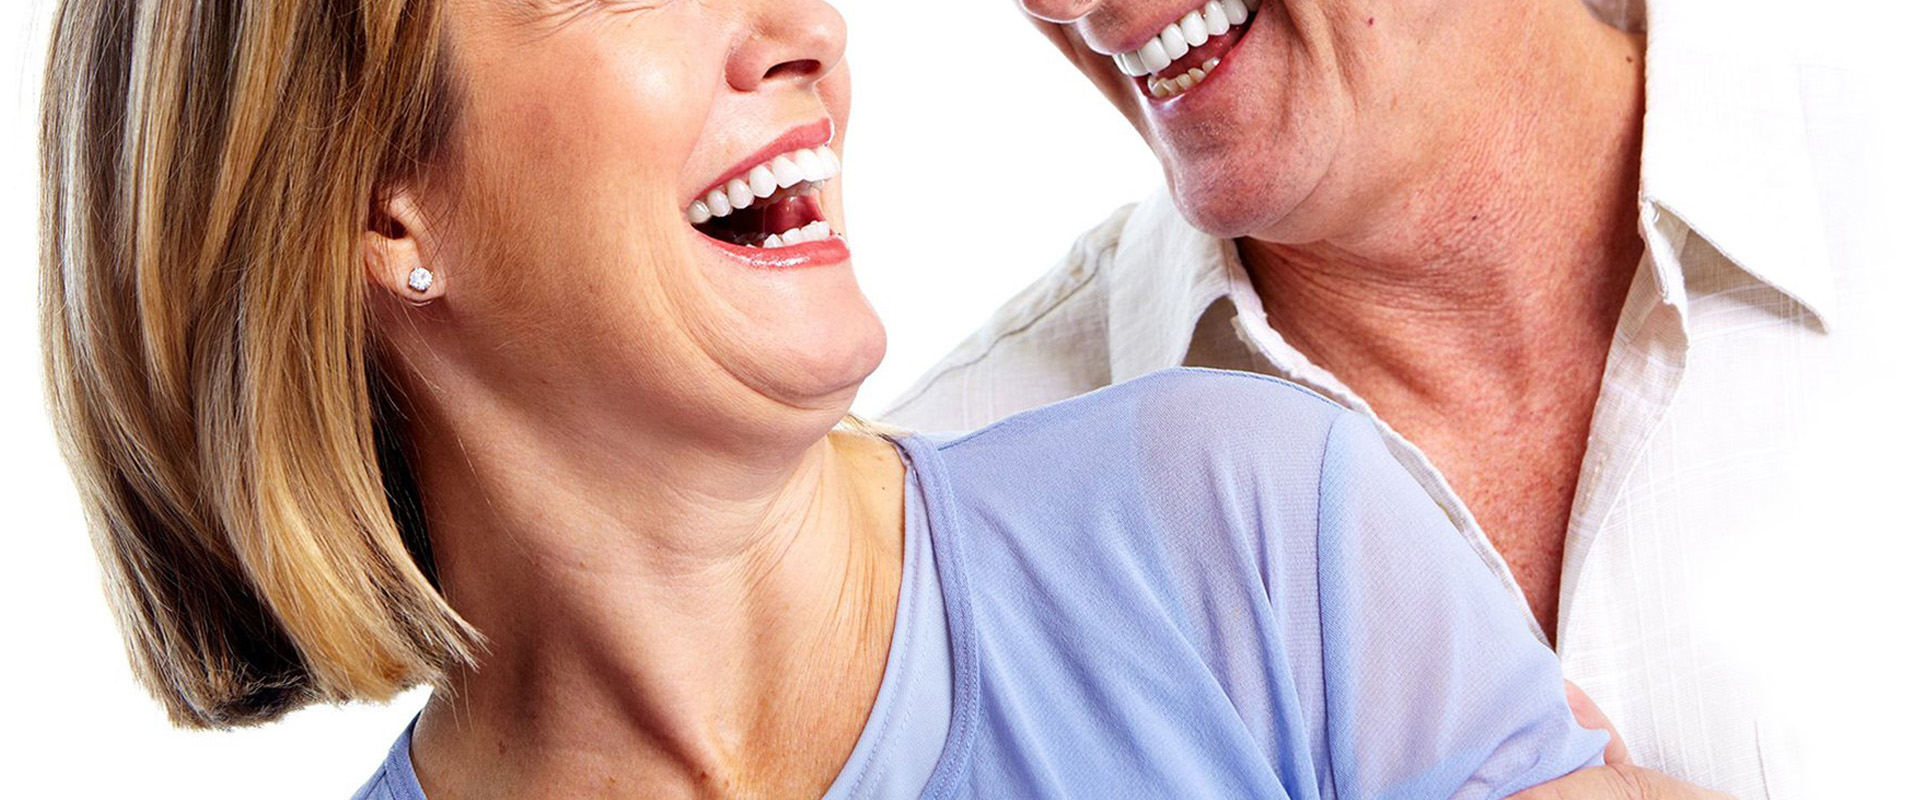 Impianti dentali perfetti